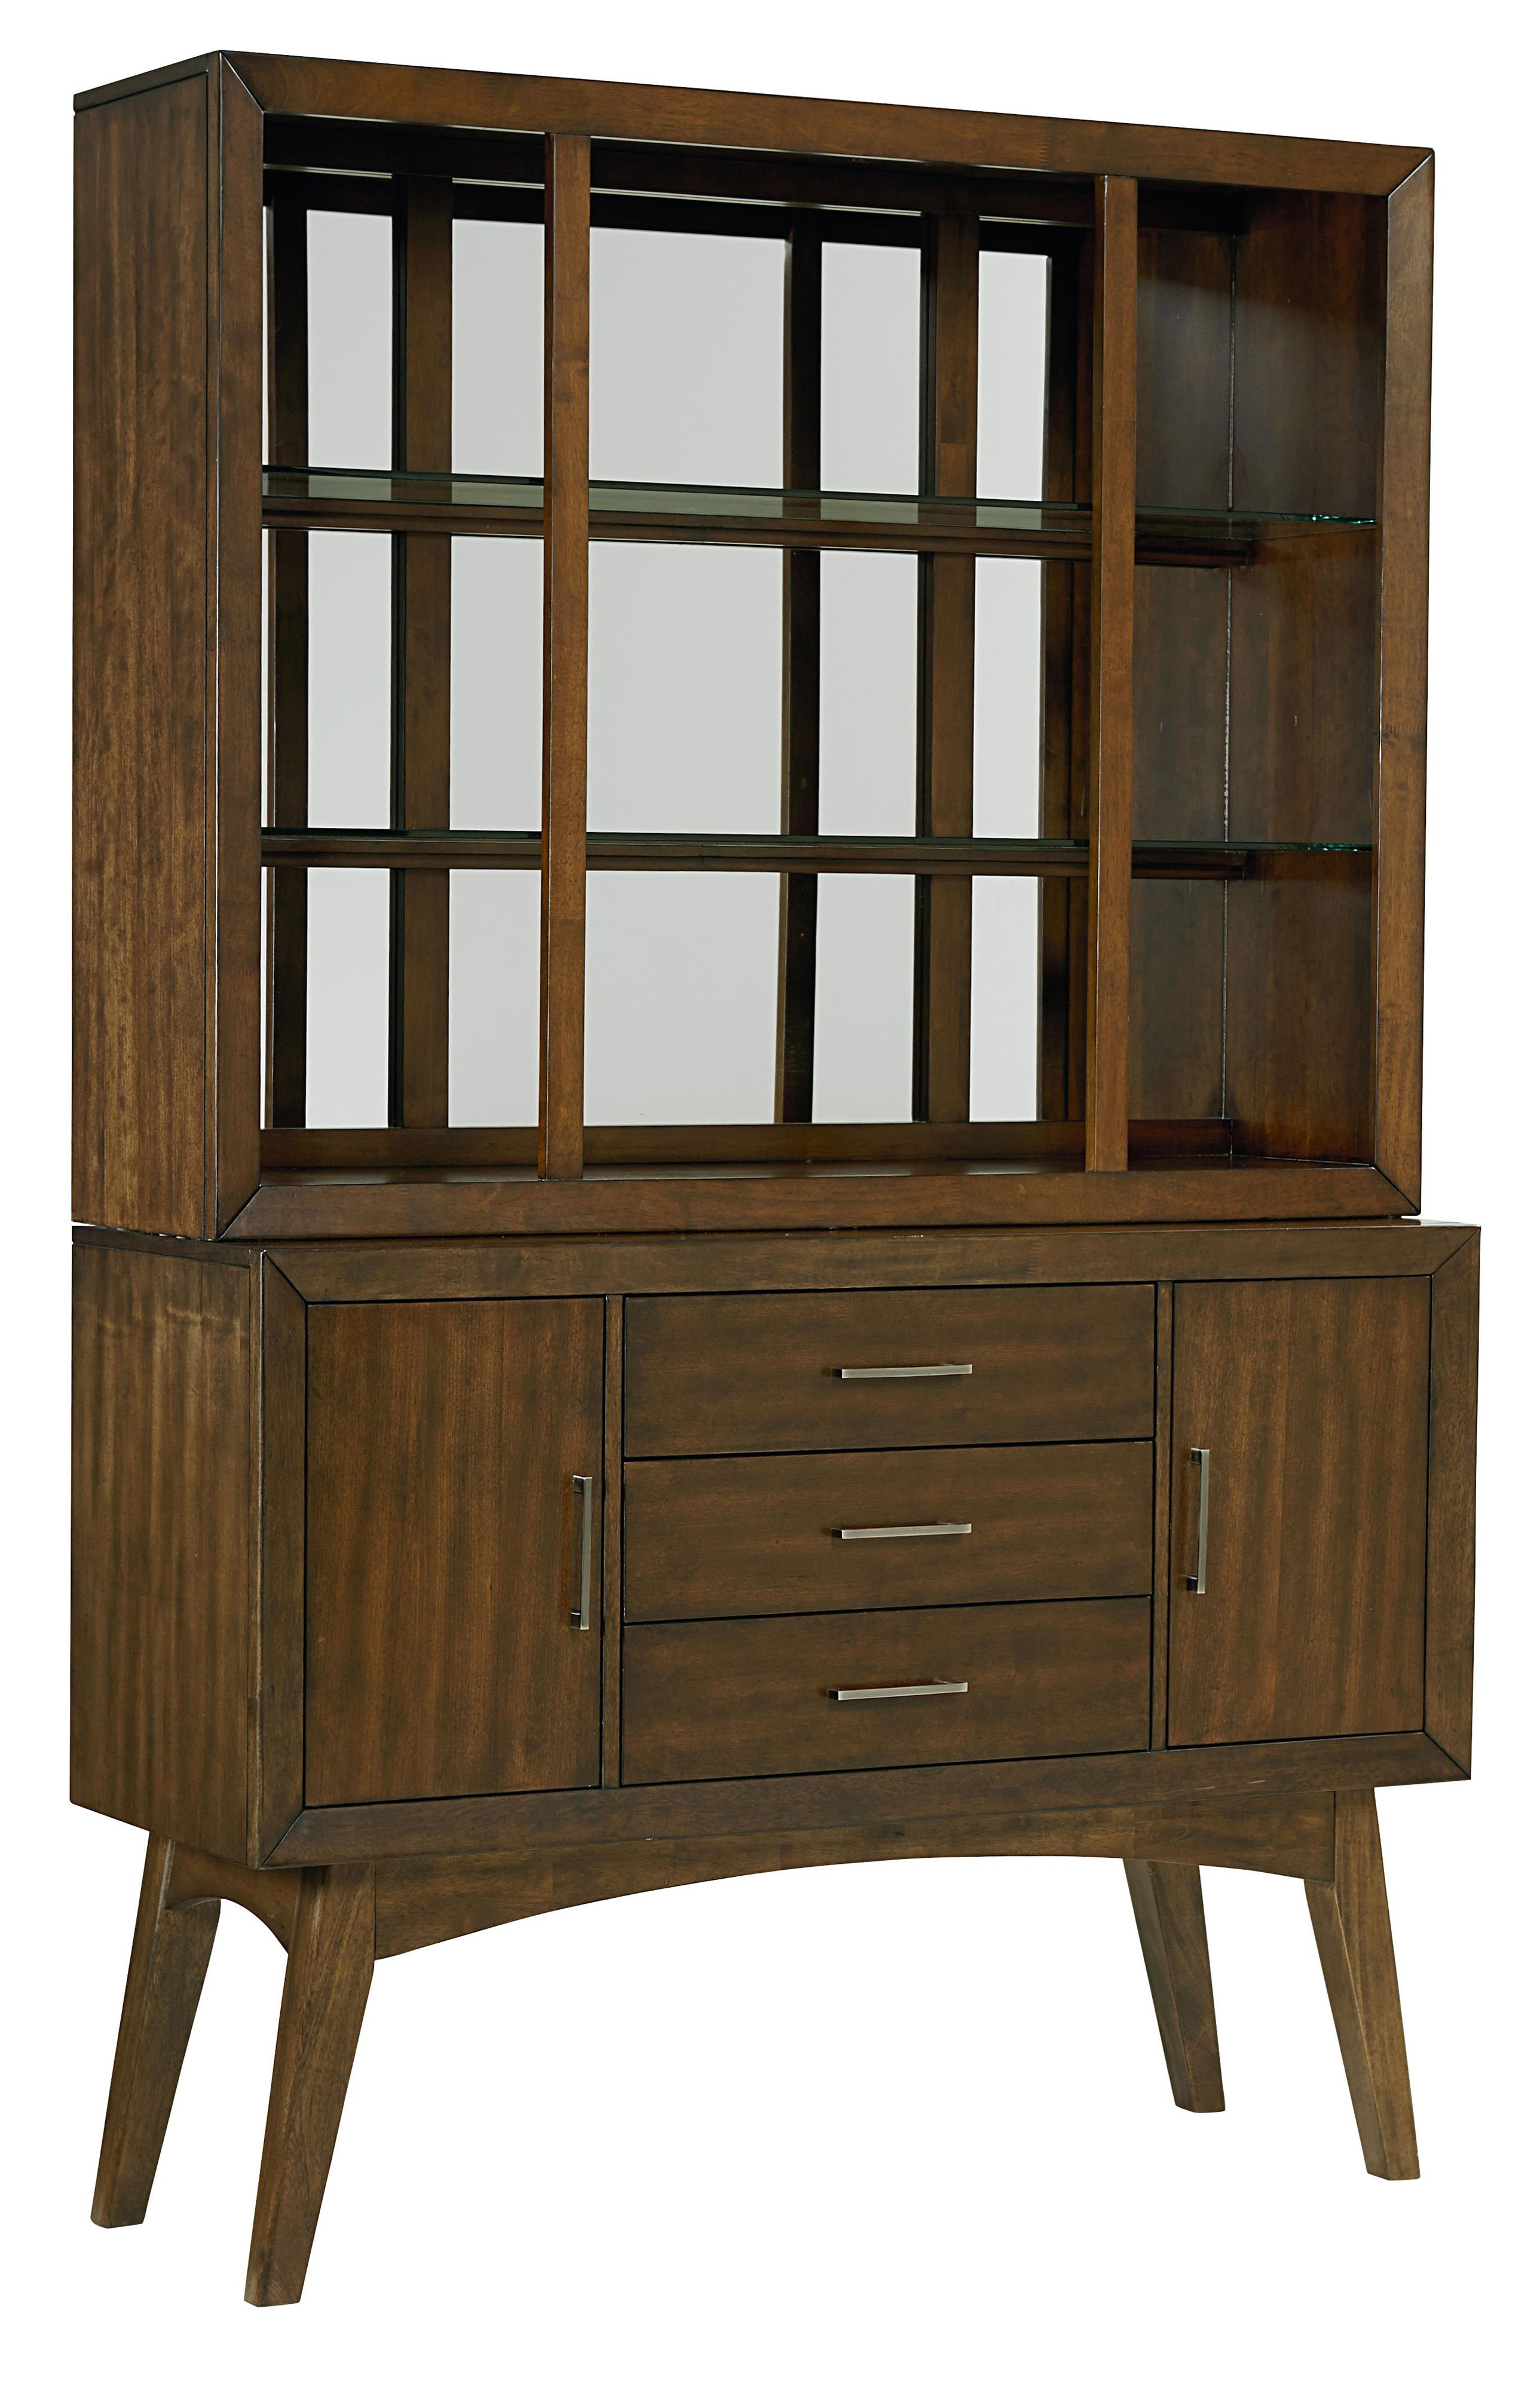 Standard Furniture Roxbury Buffet & Hutch - Item Number: 16208+16209